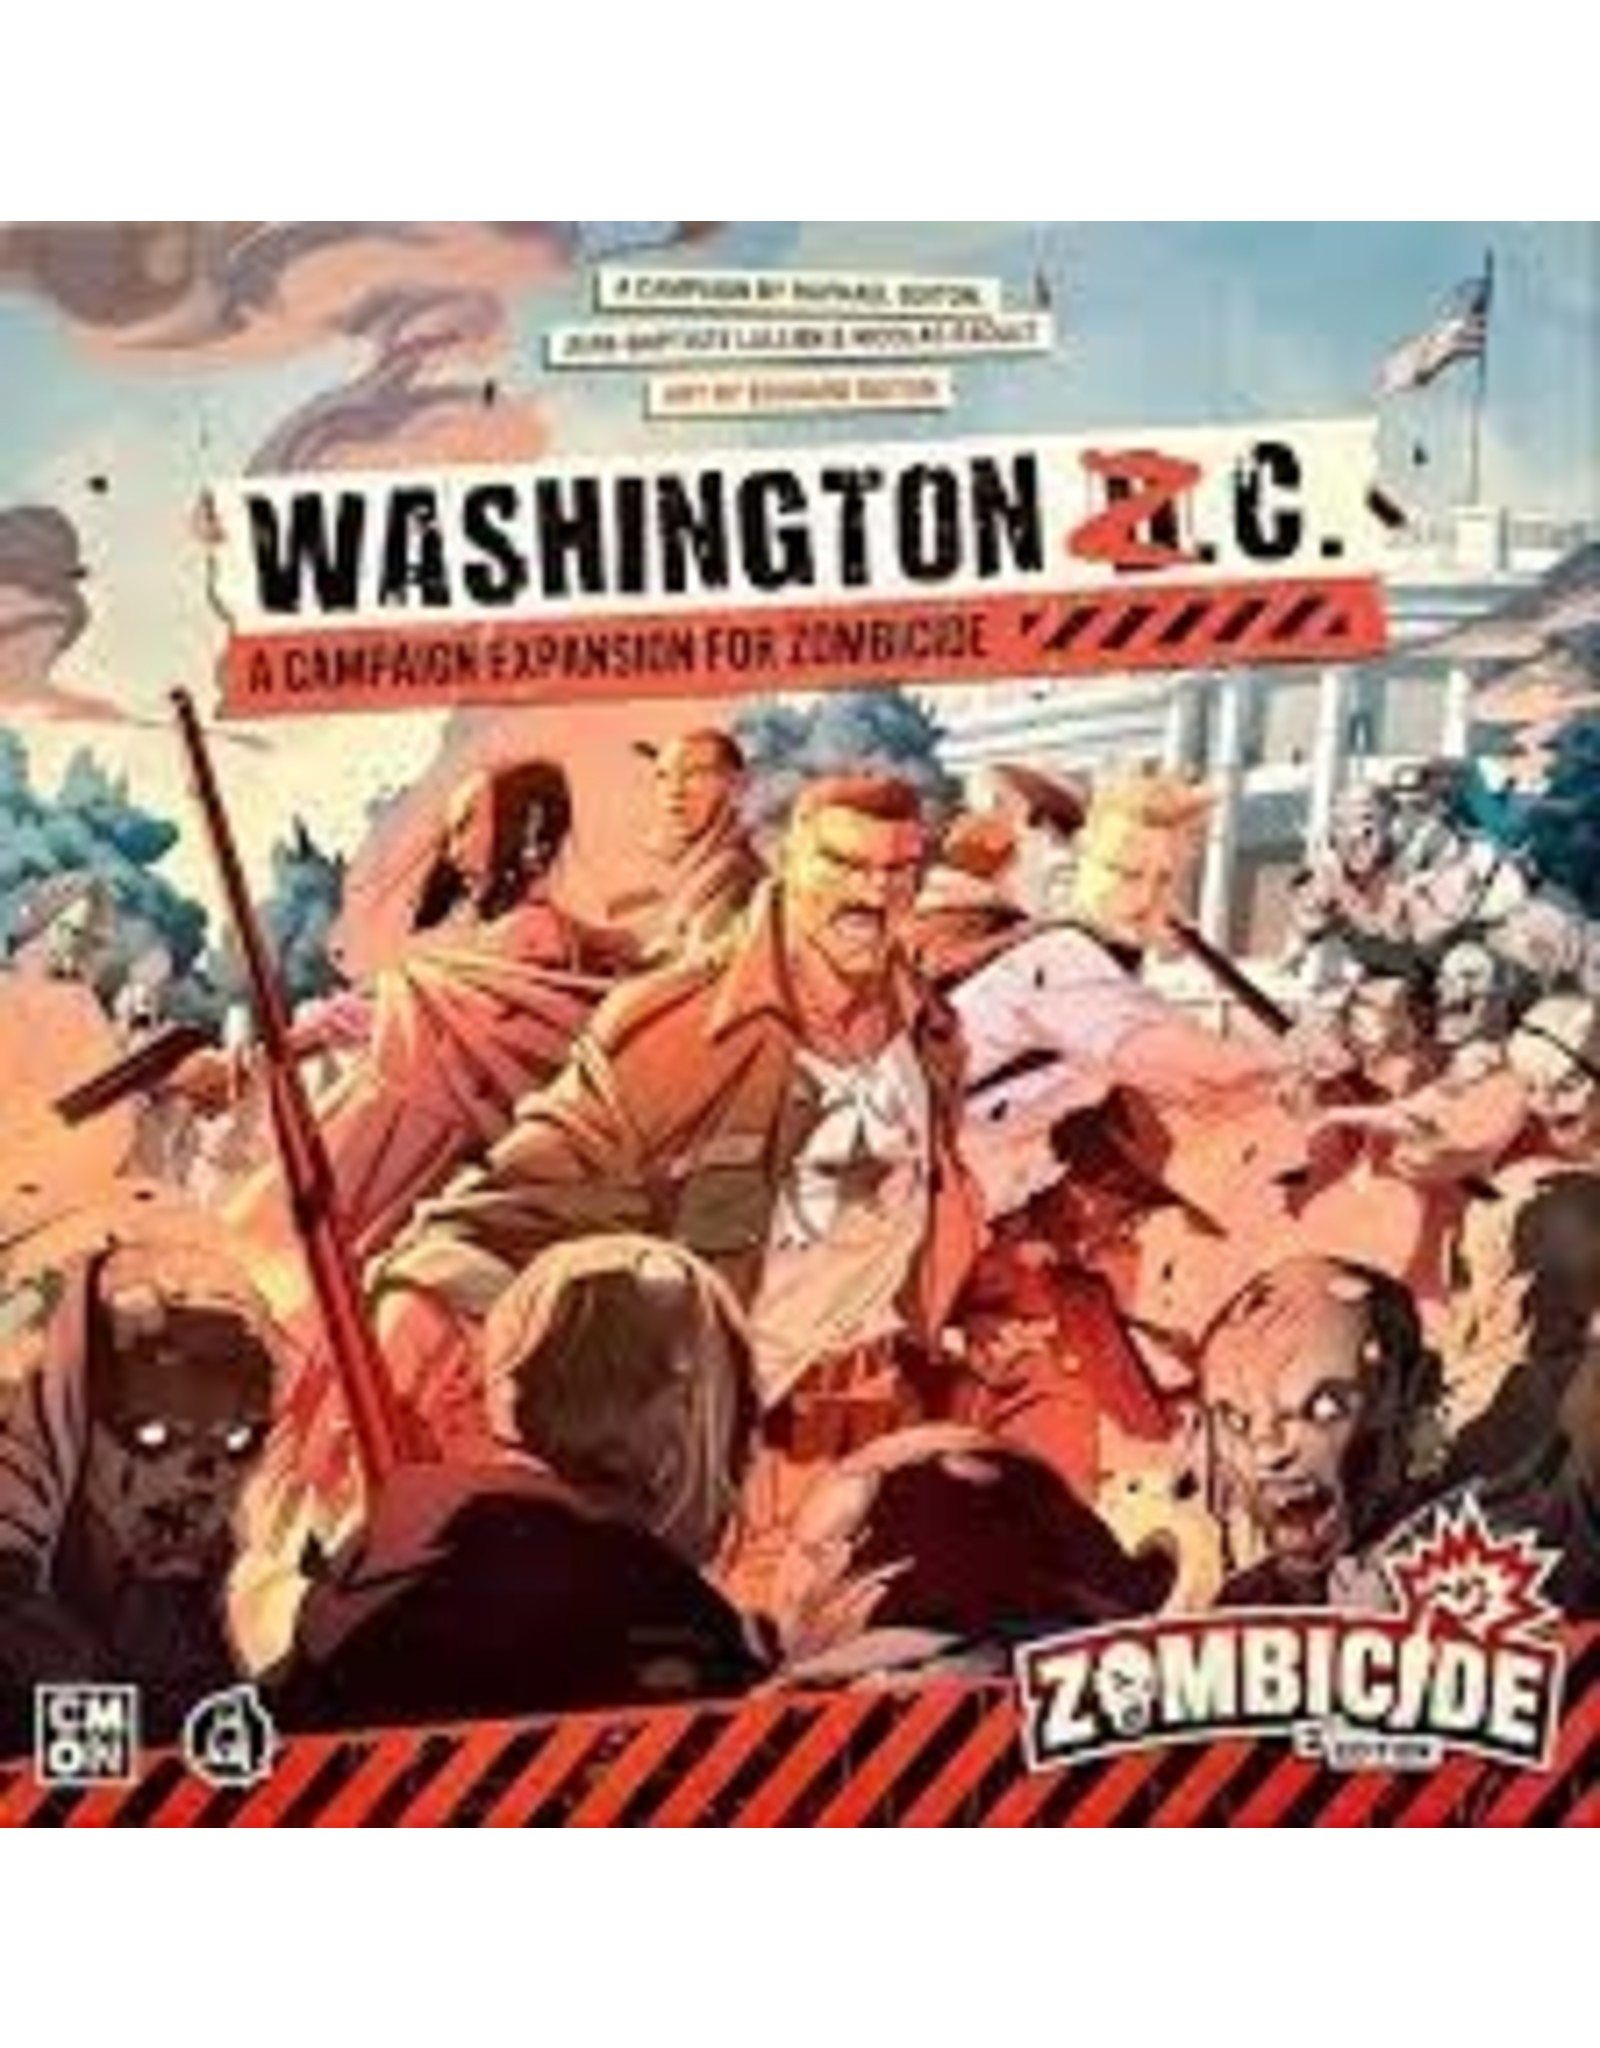 Cool Mini or Not Zombicide: Washington Z.C.